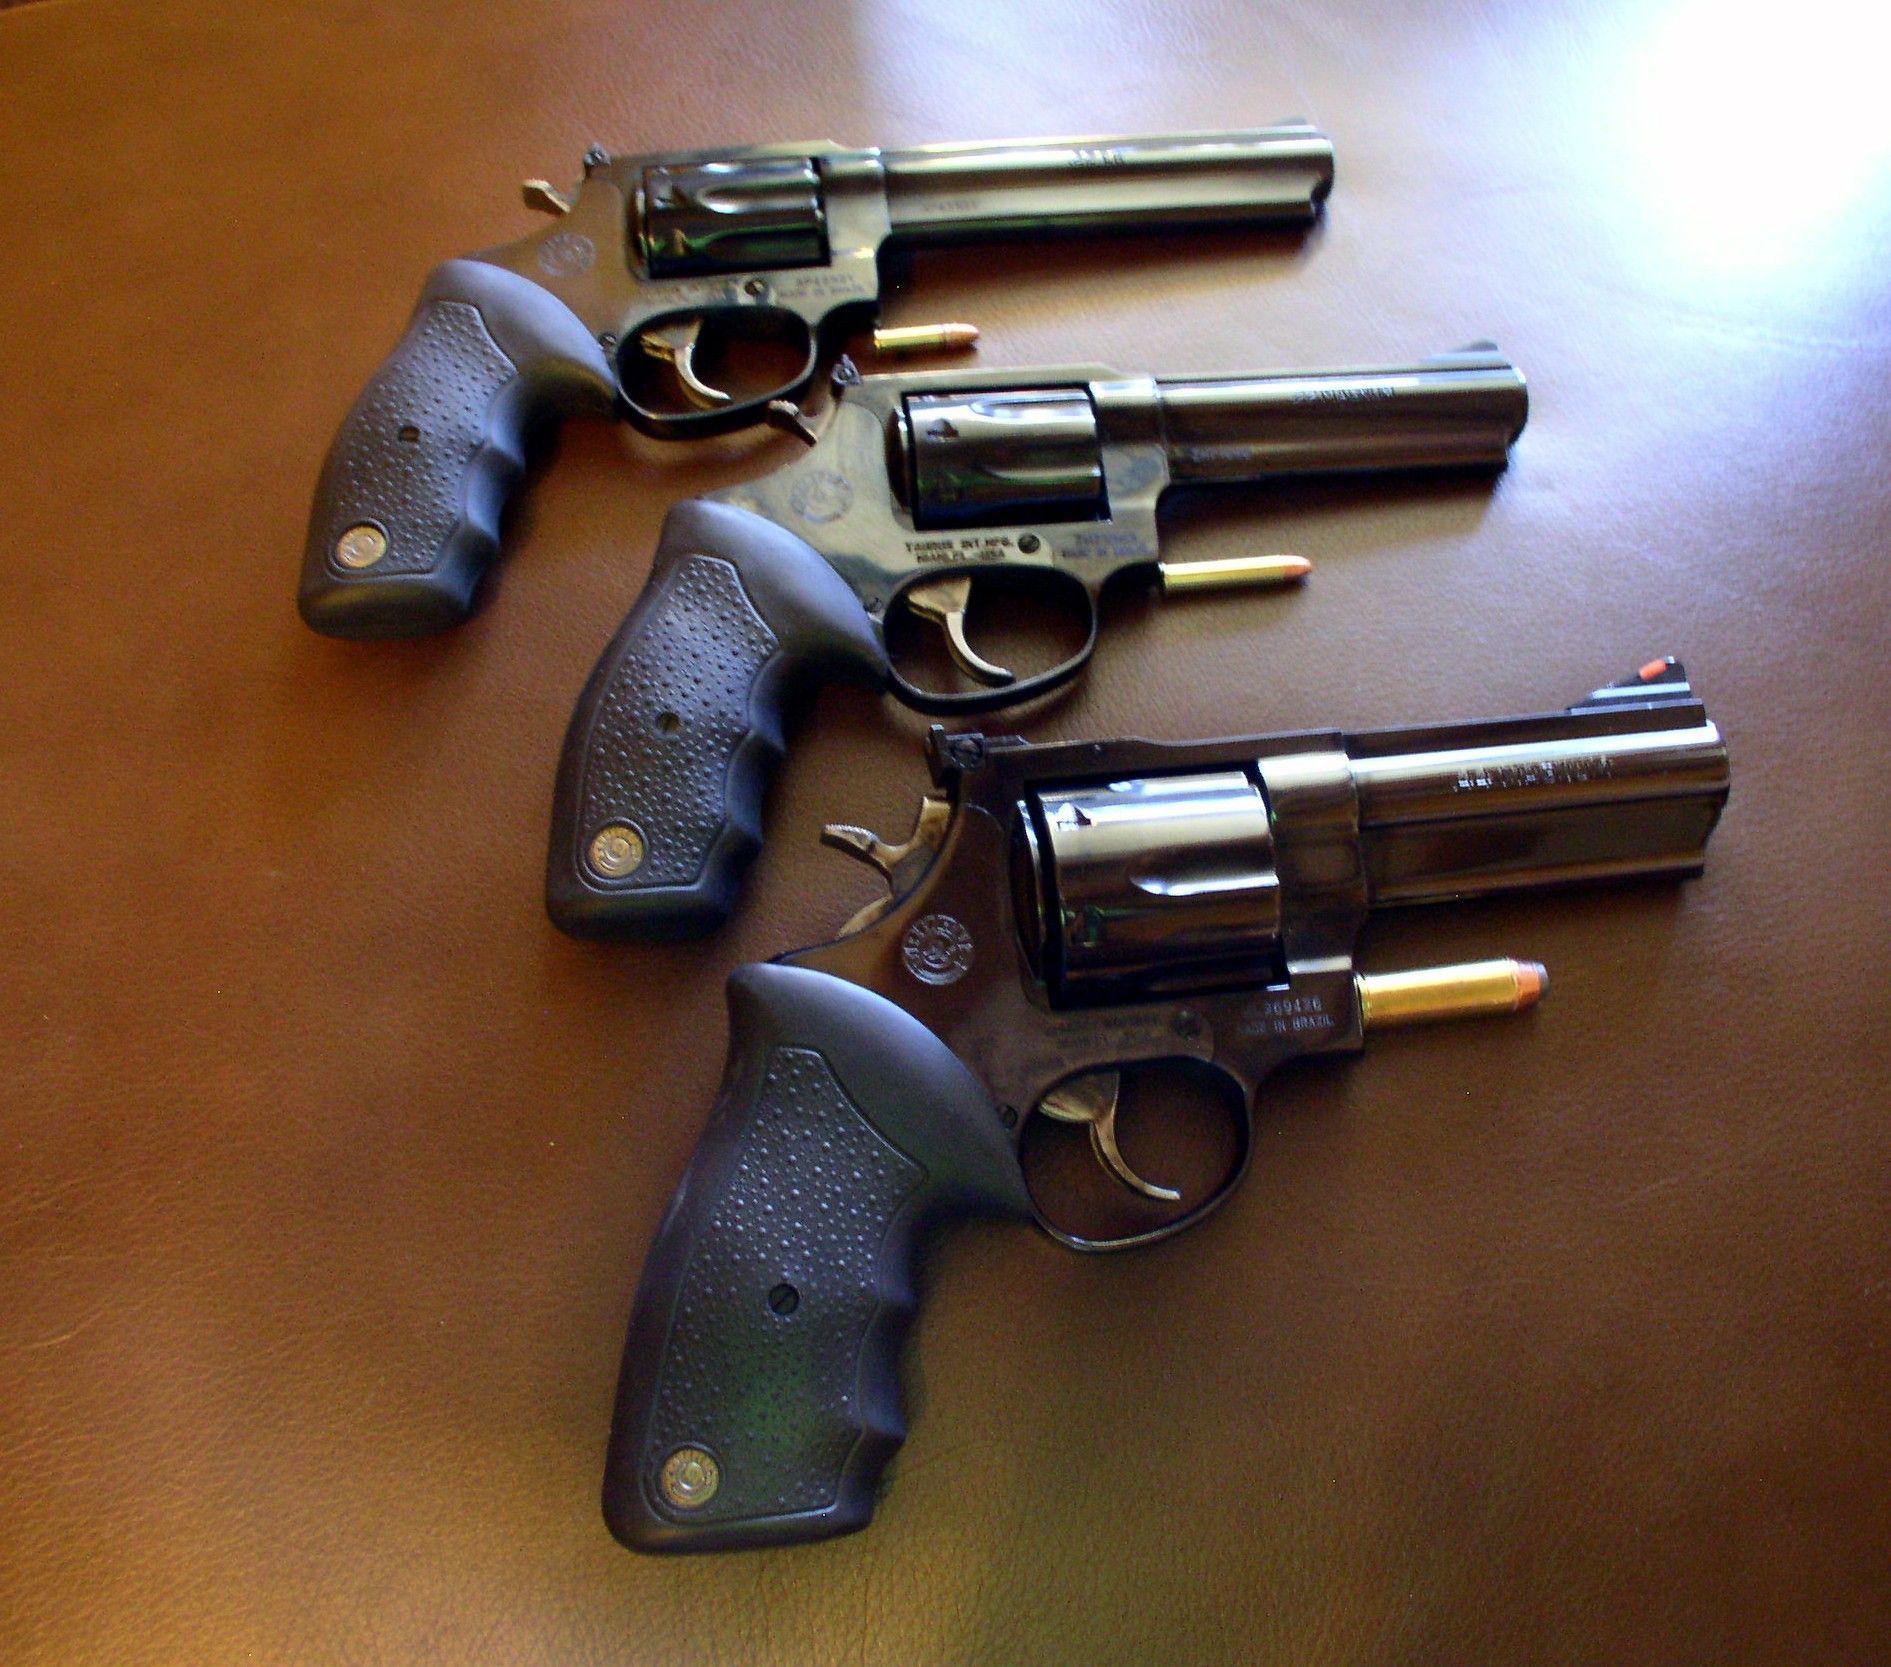 We Three Kings - Taurus Revolvers 22LR 6inch, 22Mag 4inch